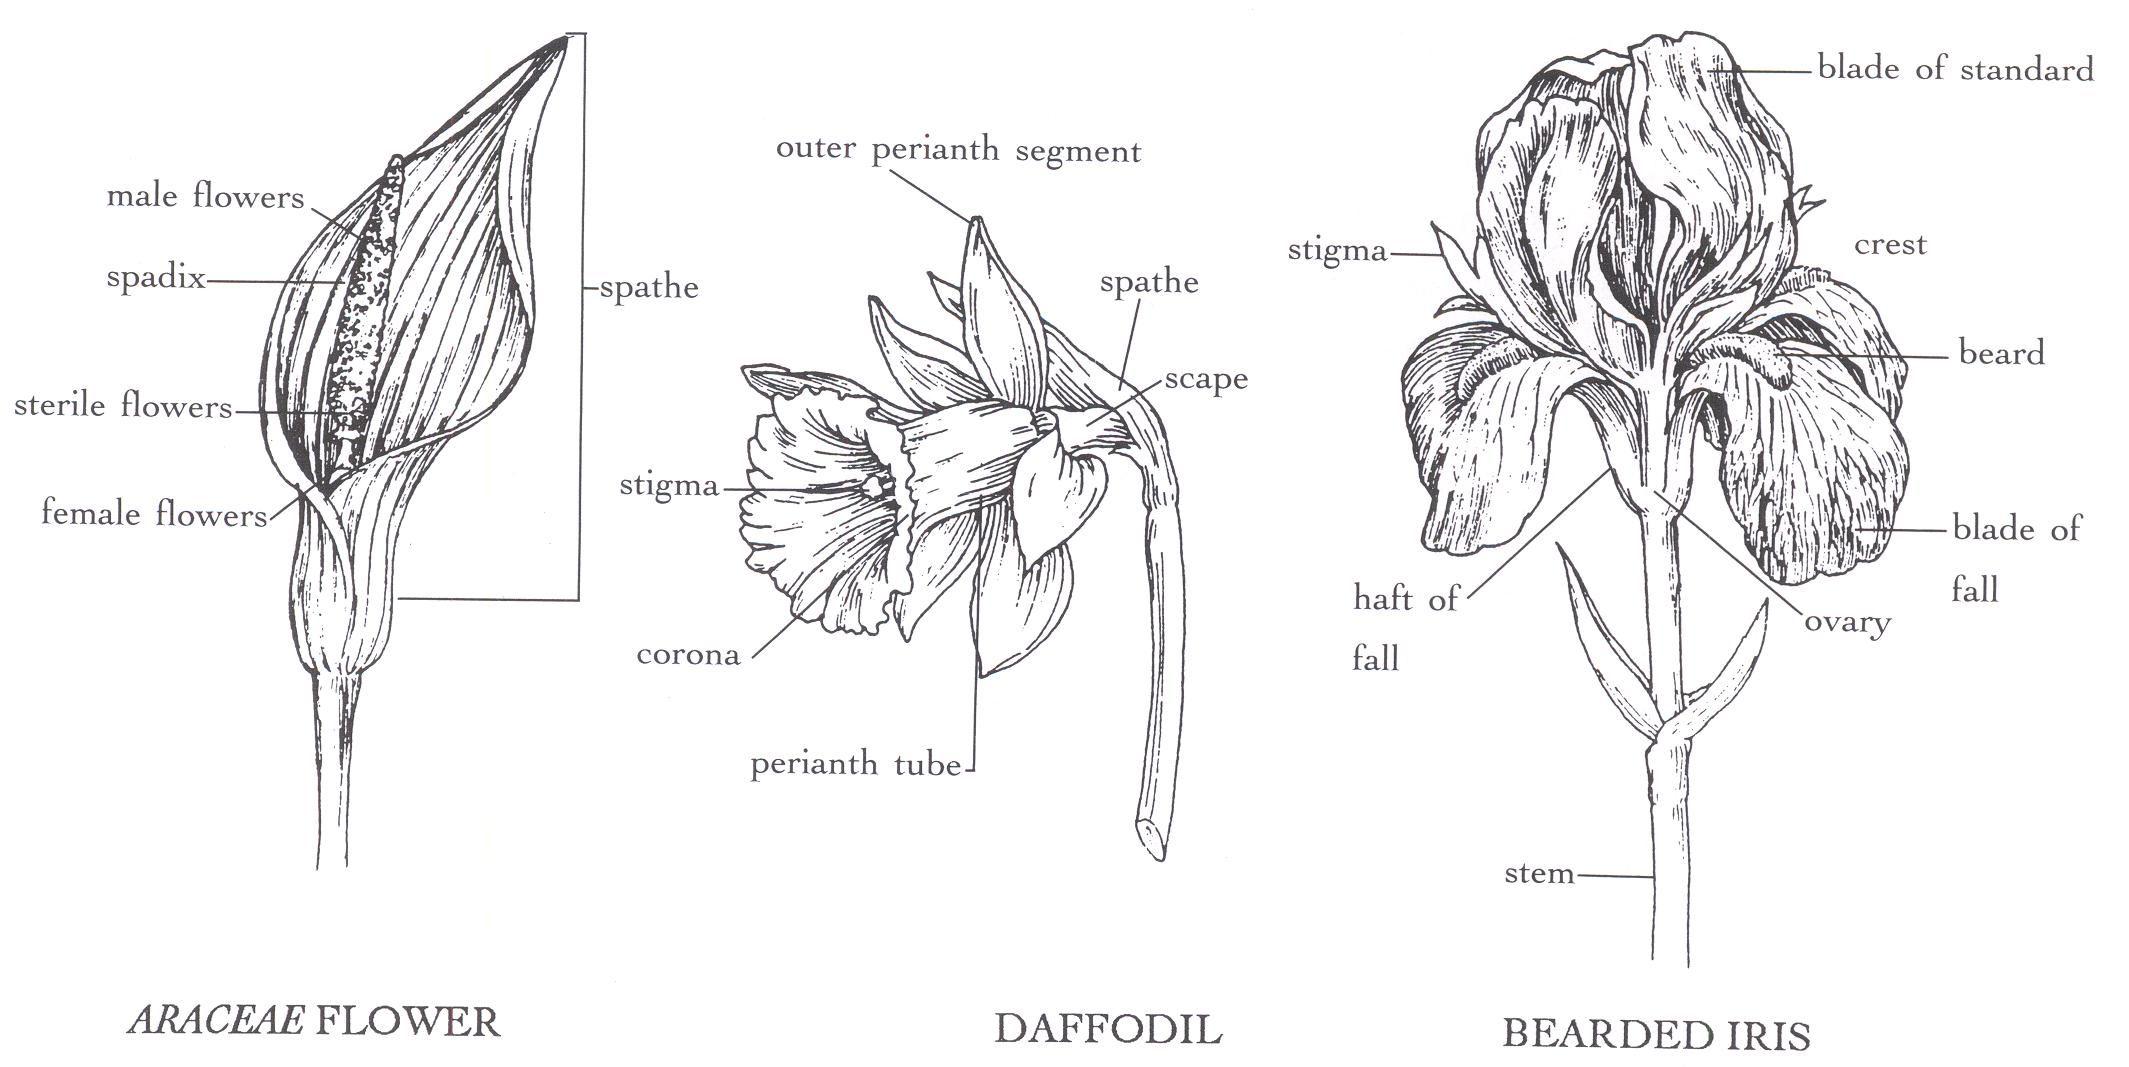 Araceae Flower Google Search Image Family Humanoid Sketch